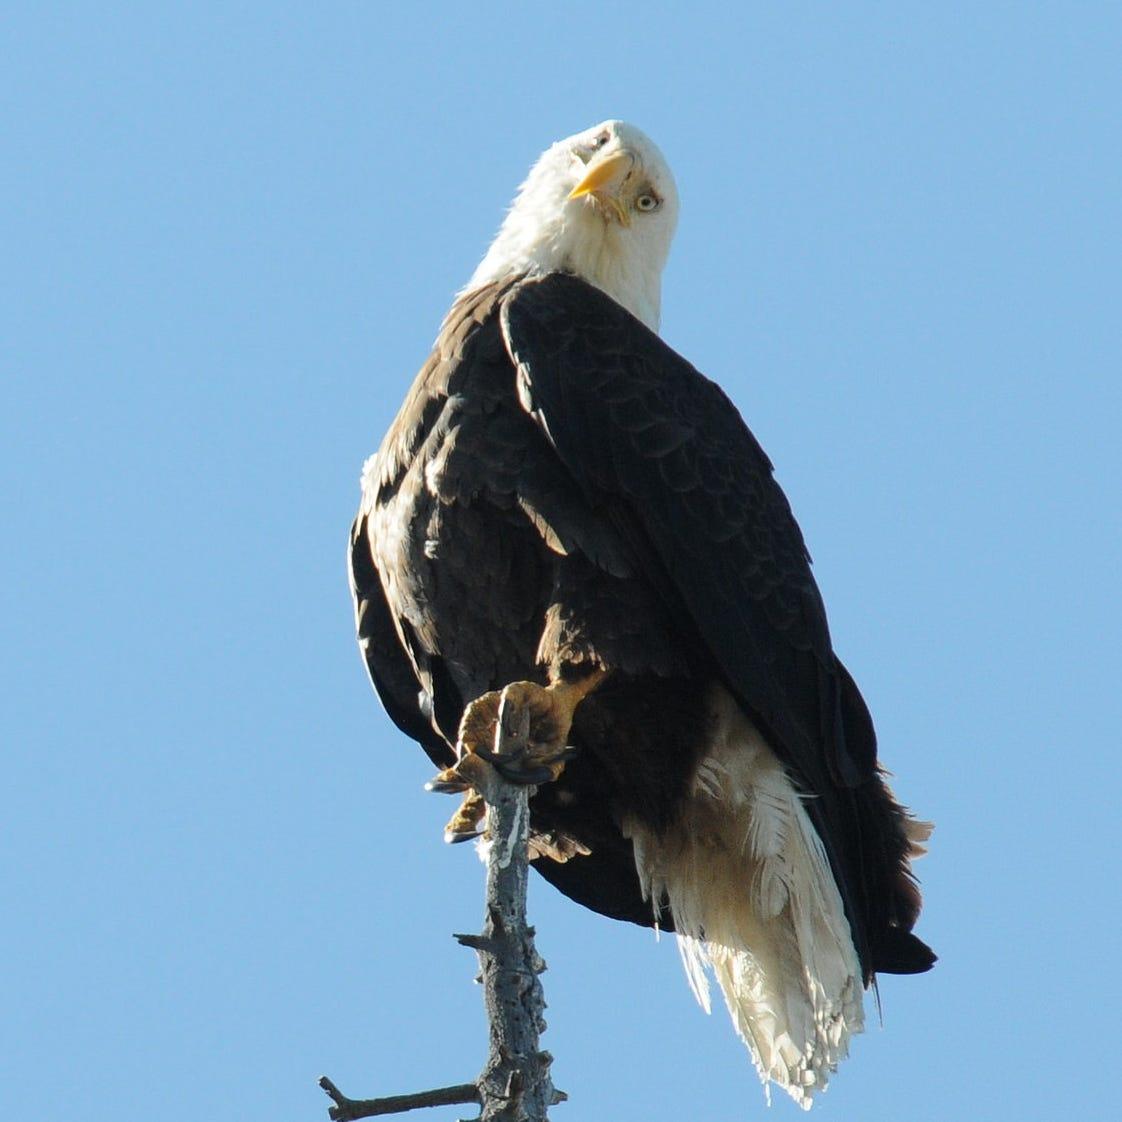 Bald eagles caught mating on camera in Big Bear, California